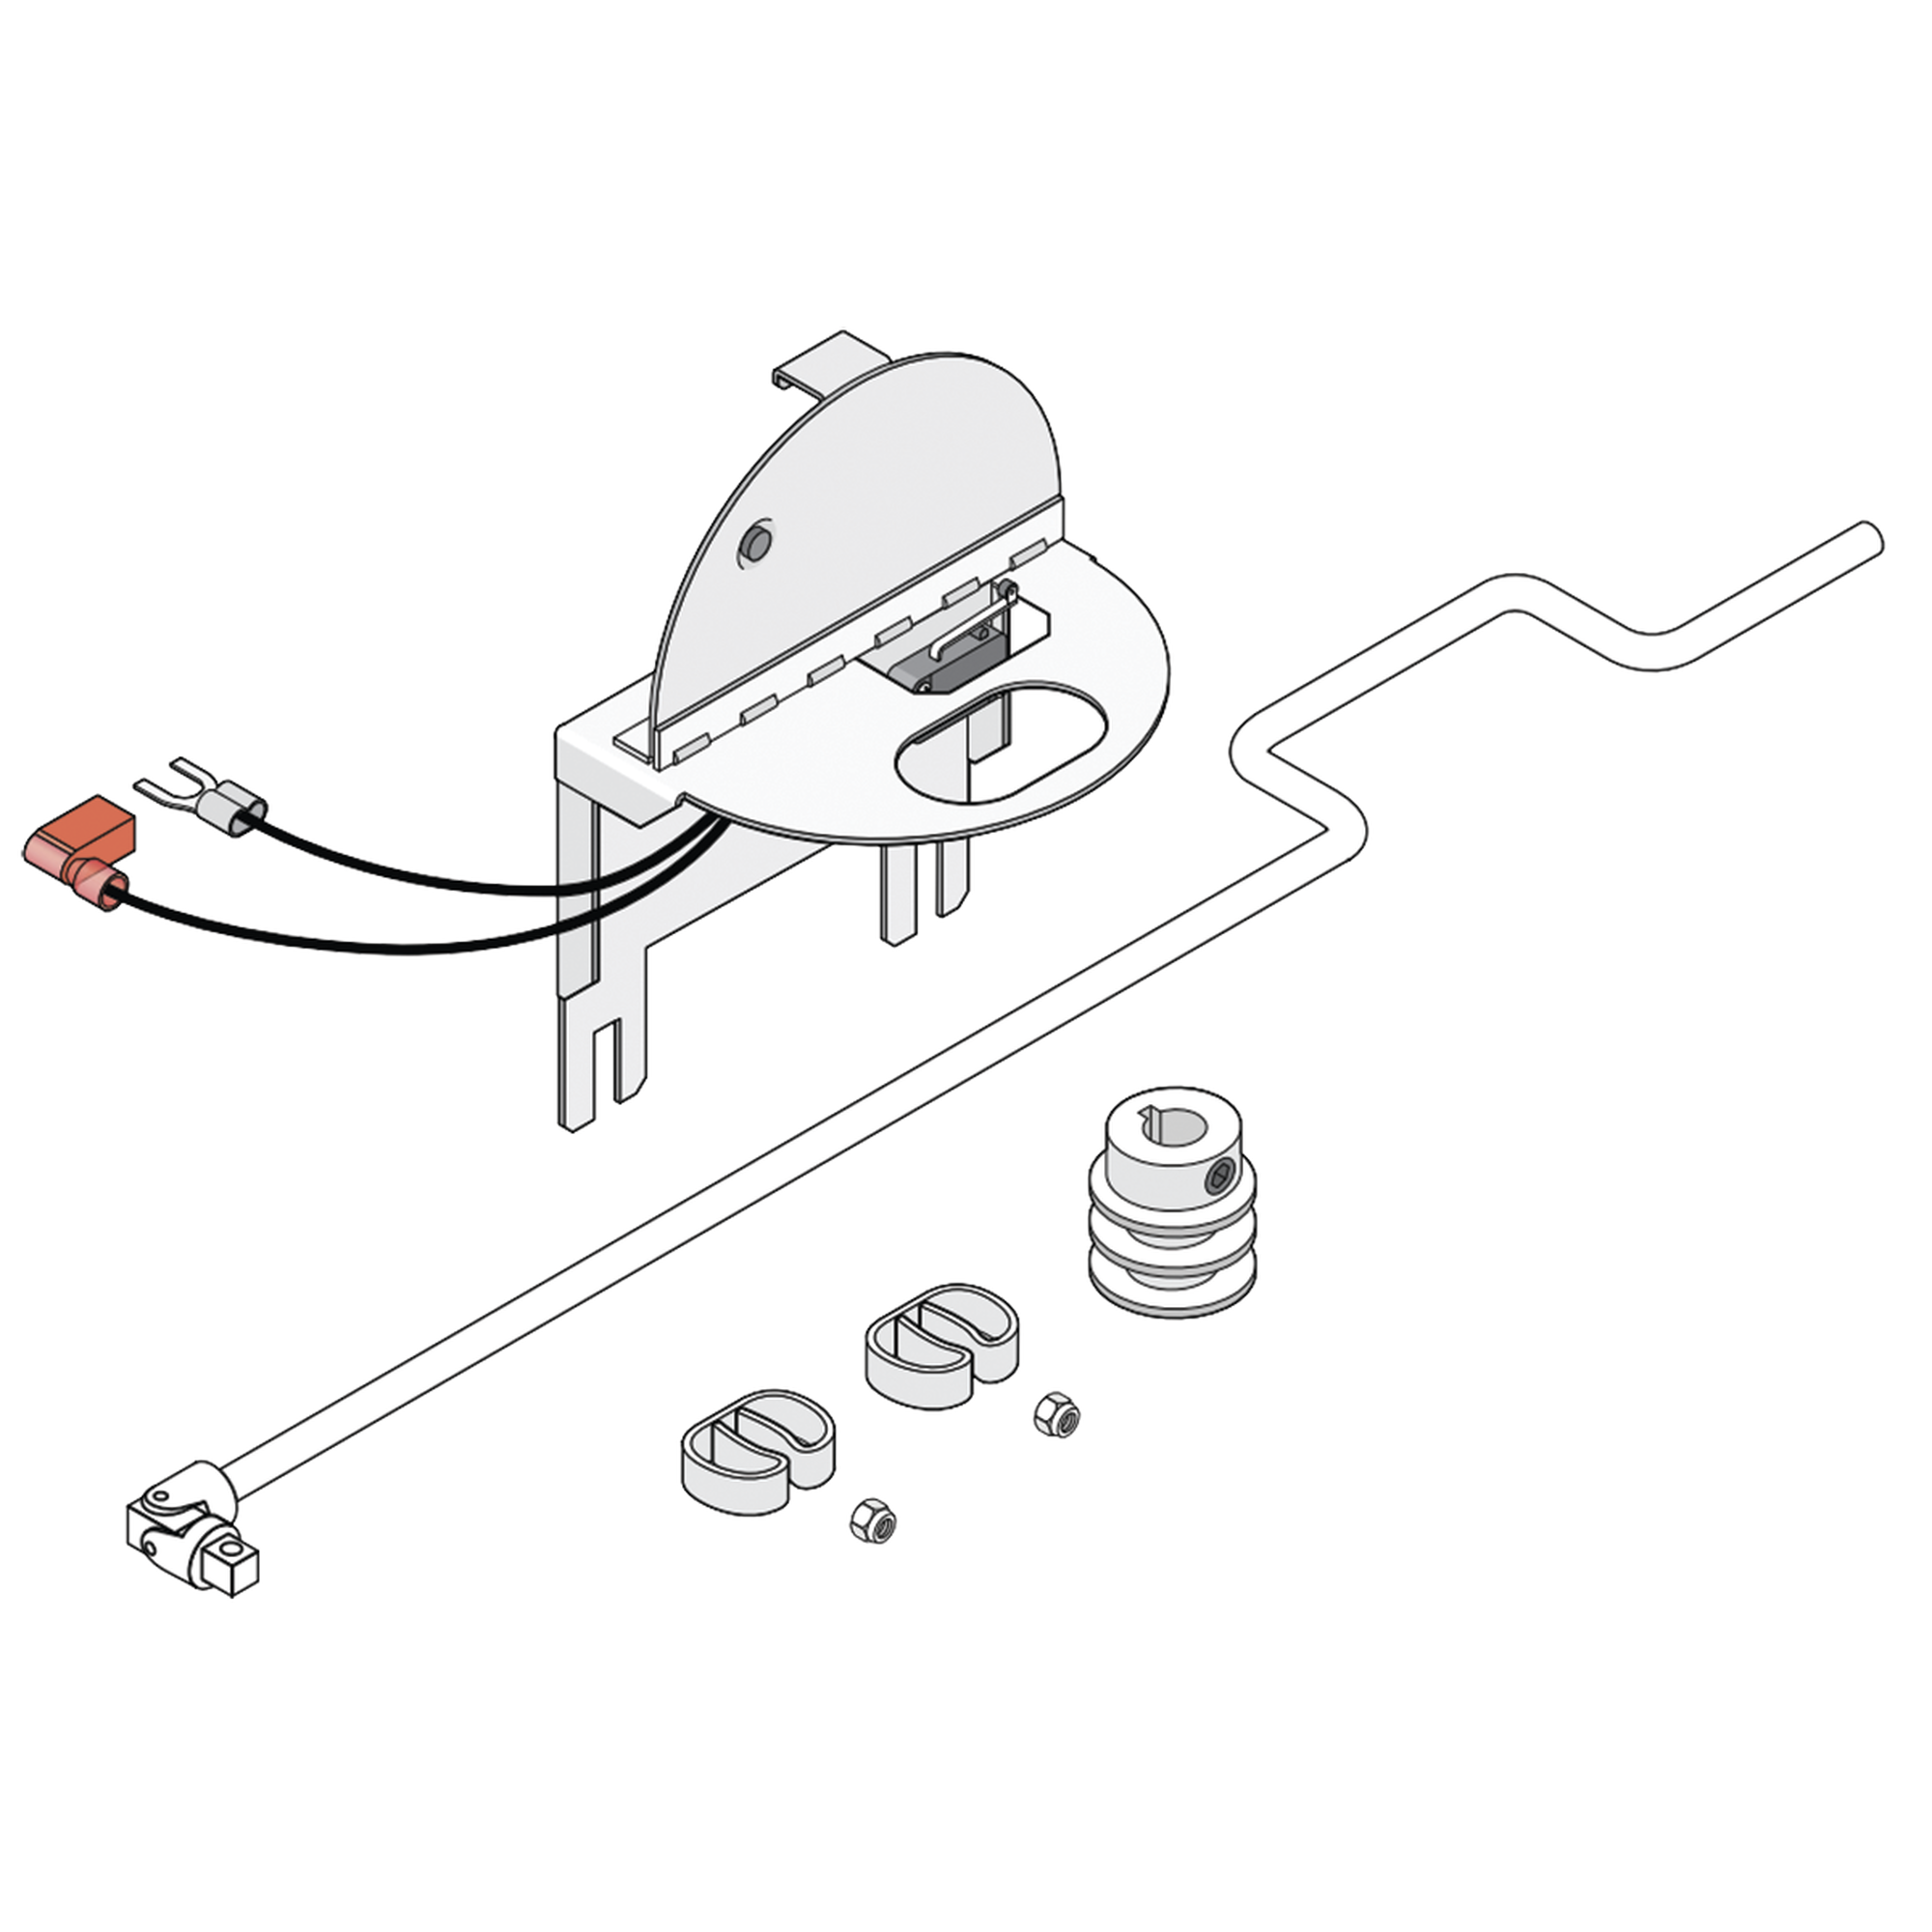 Kit de operacion manual para barrera 1601